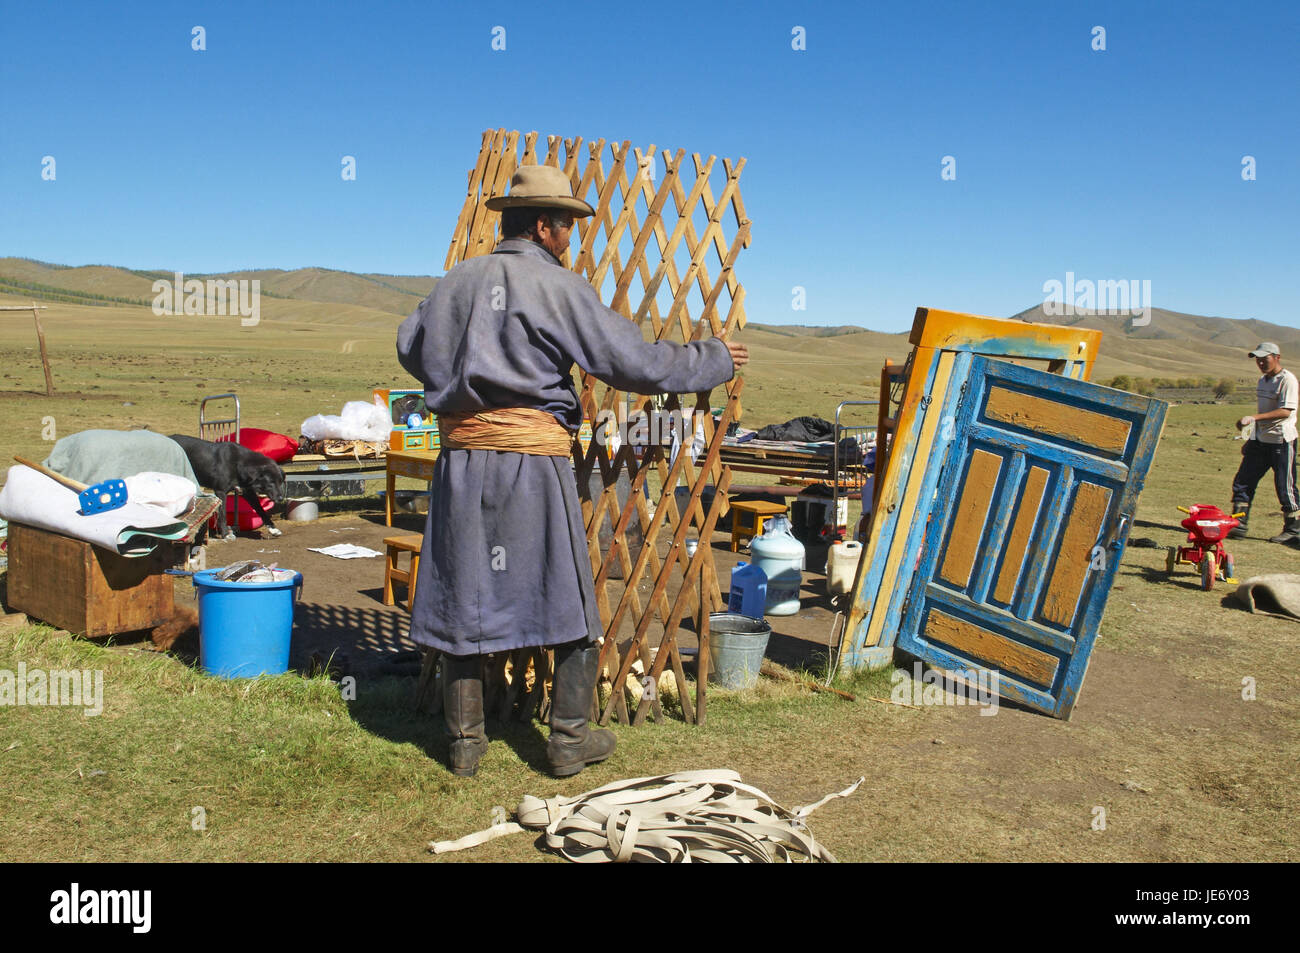 Mongolia, Central Asia, Arkhangai province, nomad, support, Jurte break down, - Stock Image